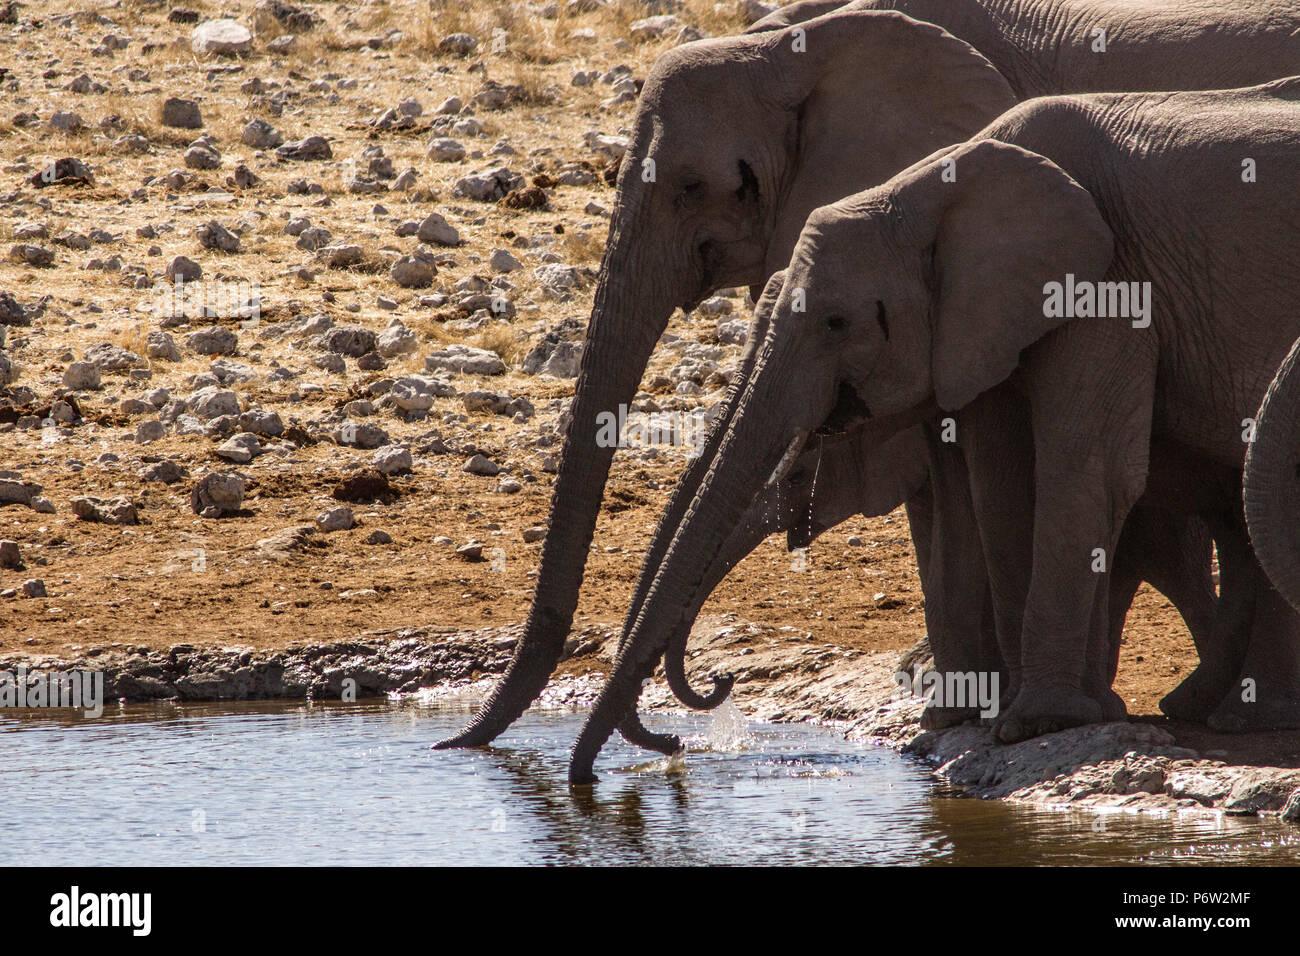 African Elephants - Loxodonta - with trunks extended drinking at an Etosha waterhole - Stock Image